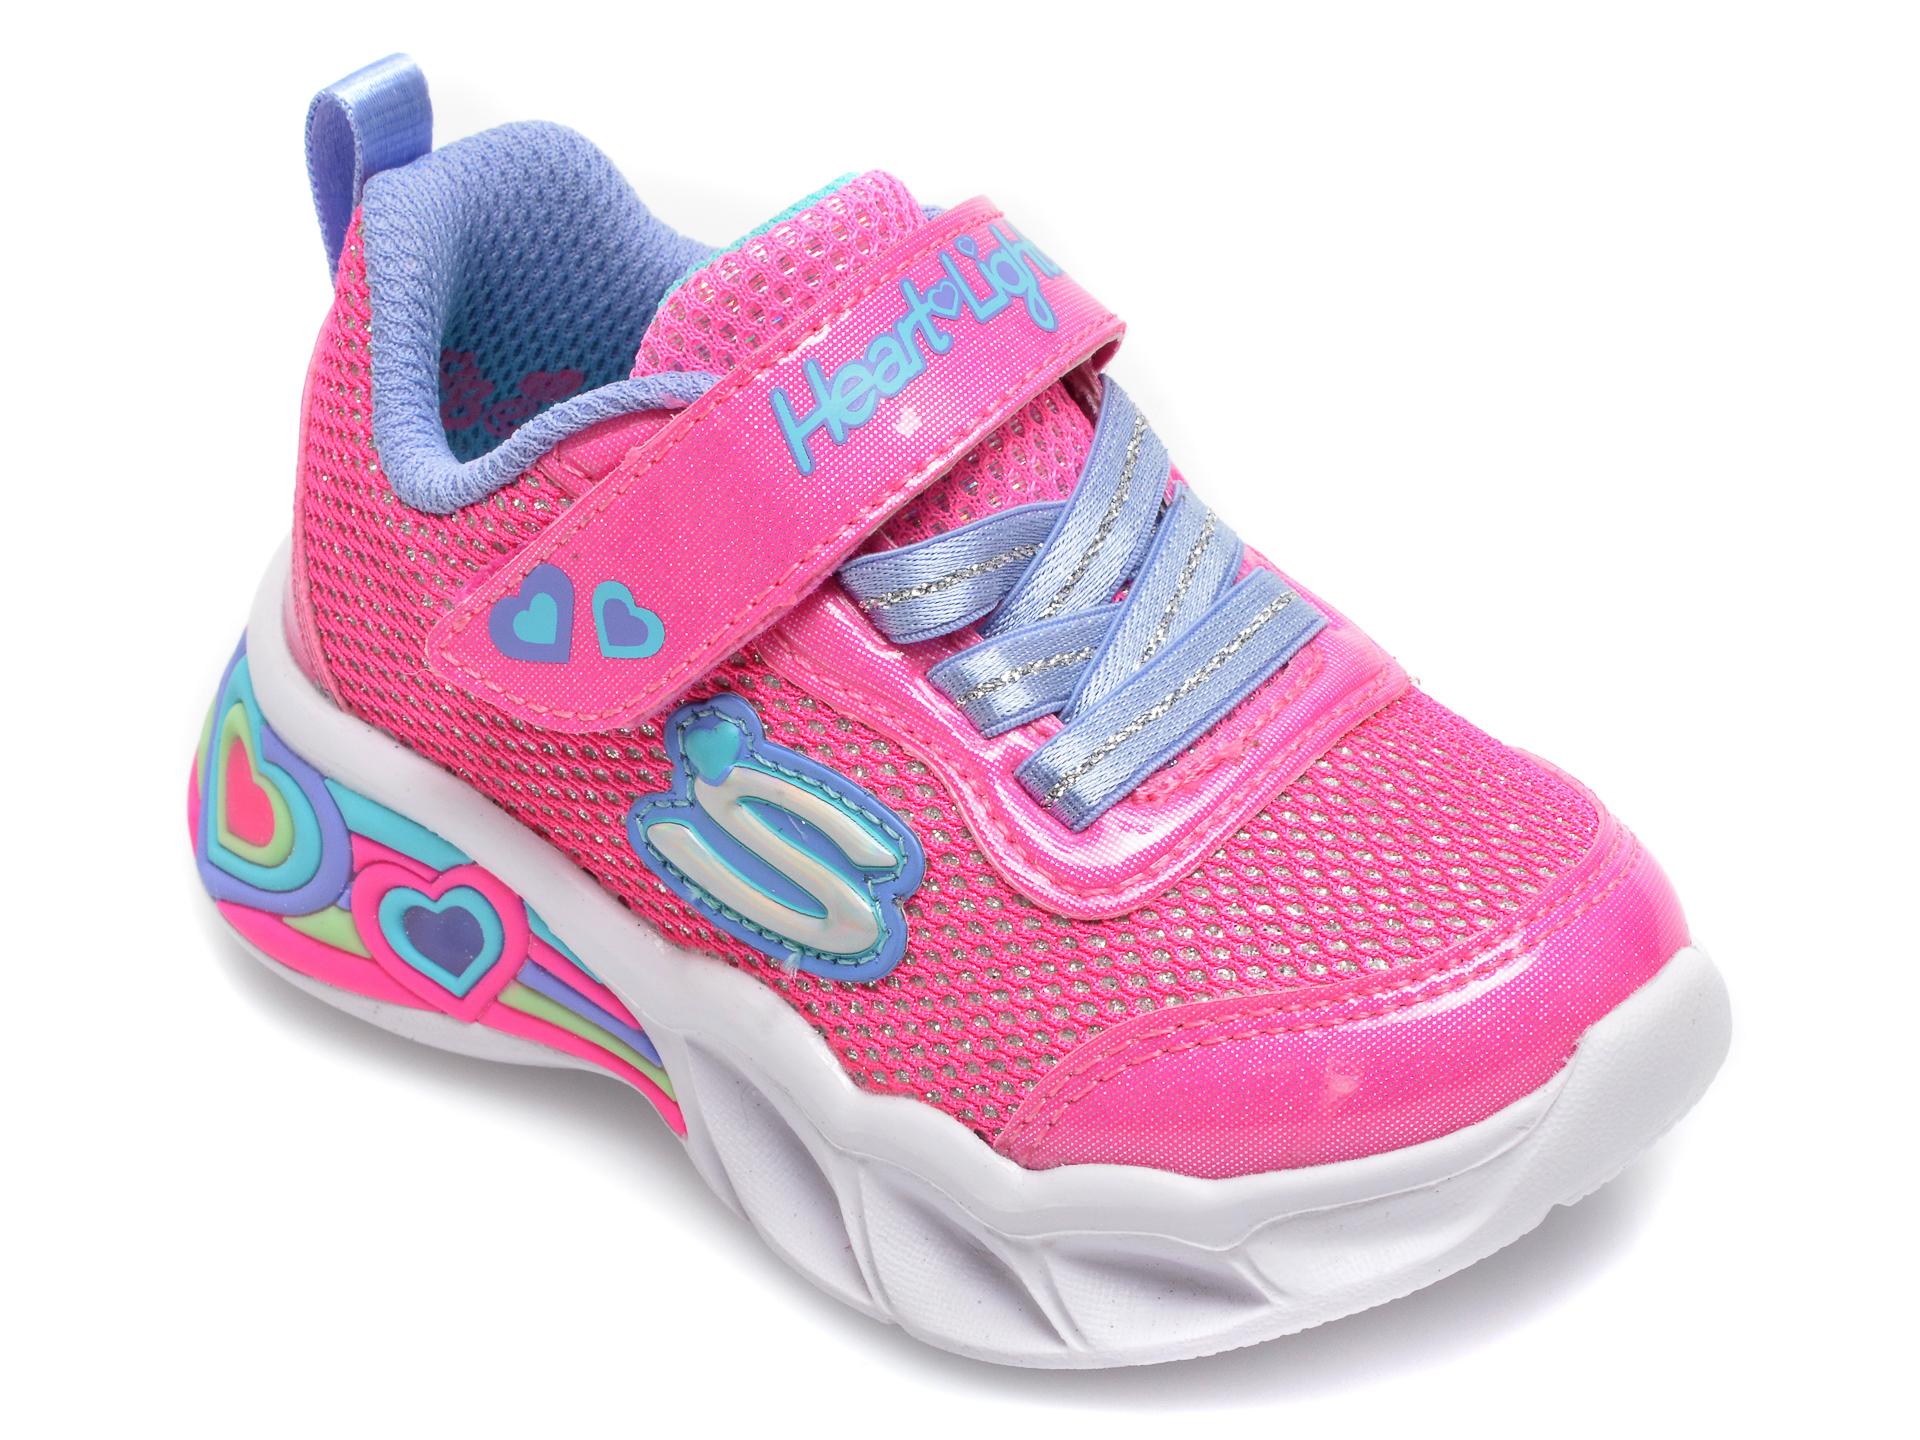 Pantofi sport SKECHERS roz, Sweetheart Lights Shimmer Spells, din piele ecologica